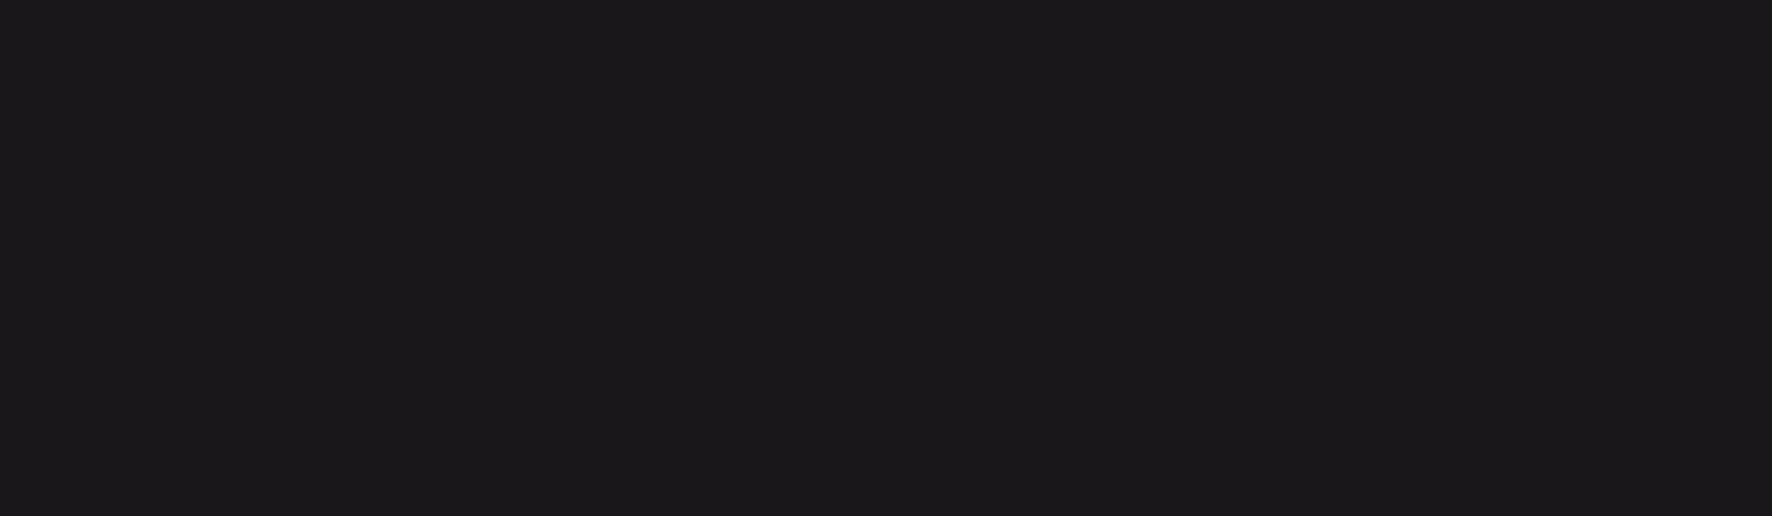 SvenskaKraftnat.png